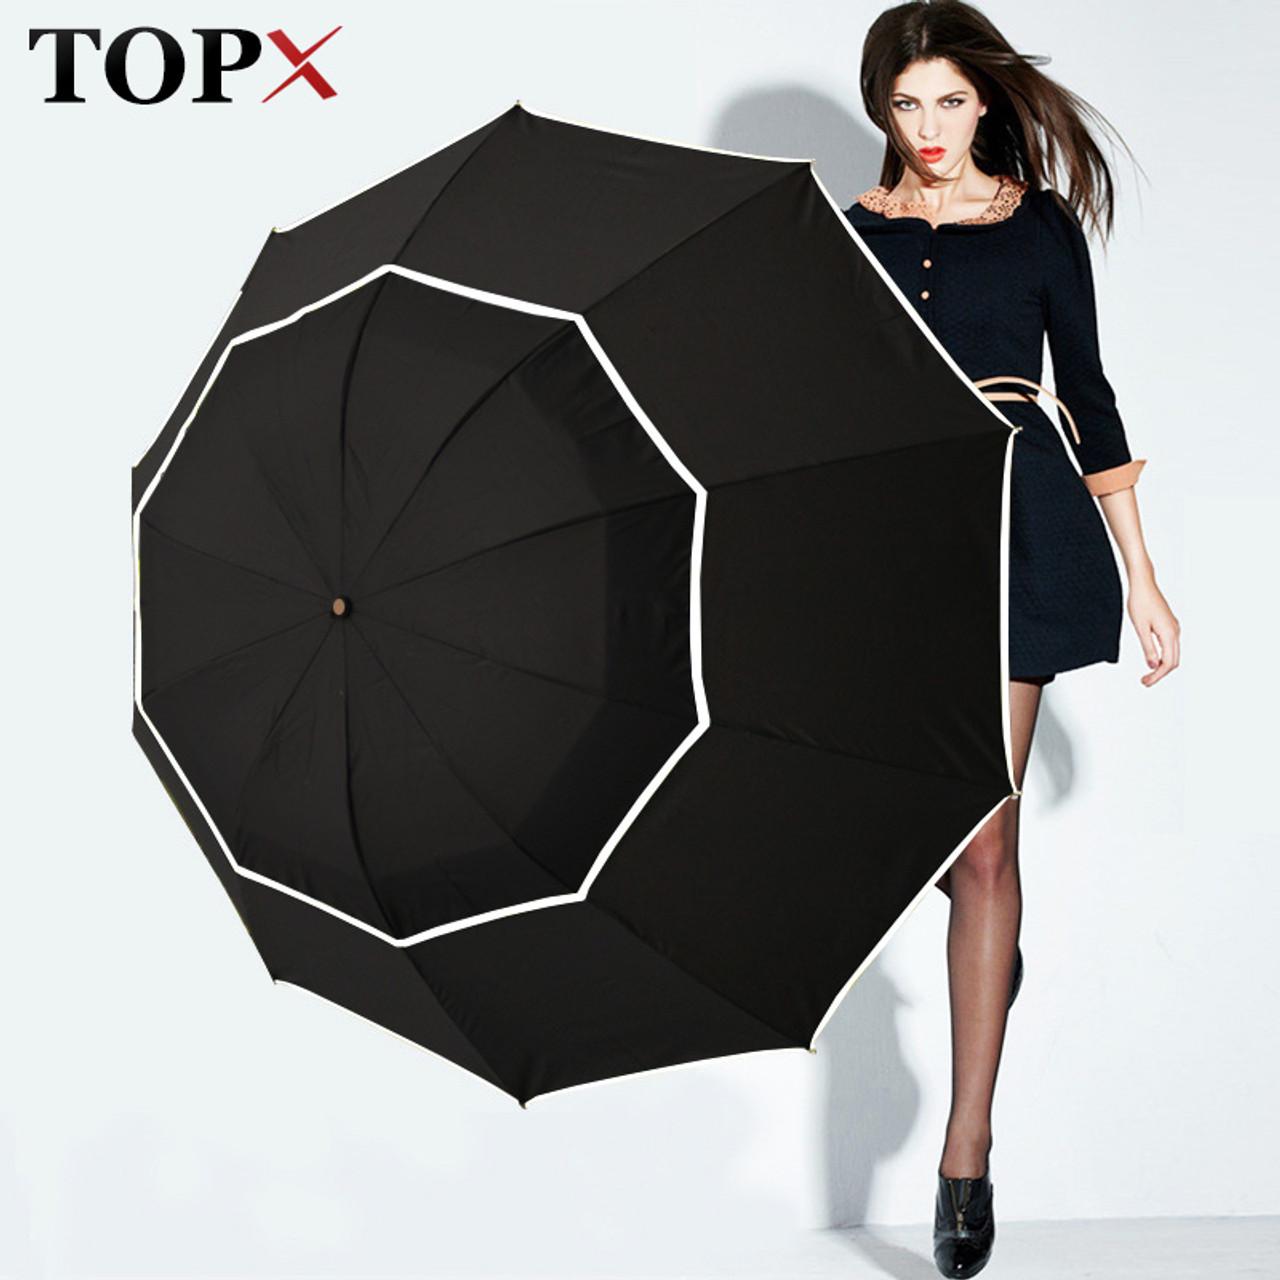 f51d1f9d9 TOPX Big Top Quality Umbrella Men Rain Woman Windproof Large Paraguas Male  Women Sun 3 Folding ...